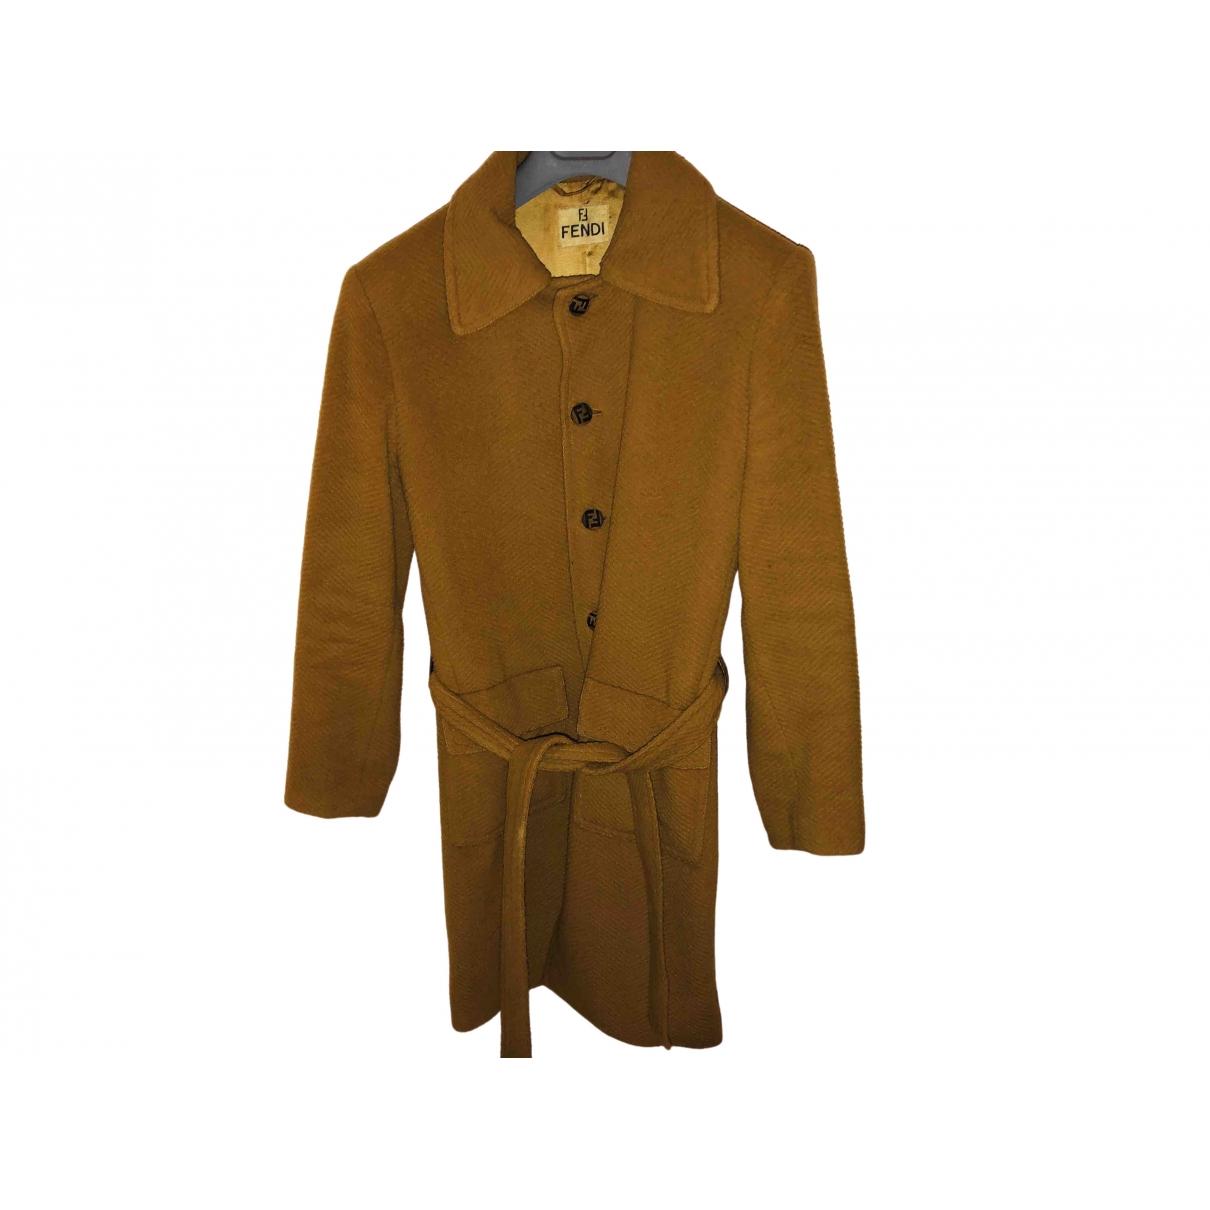 Fendi \N Wool coat for Women M International